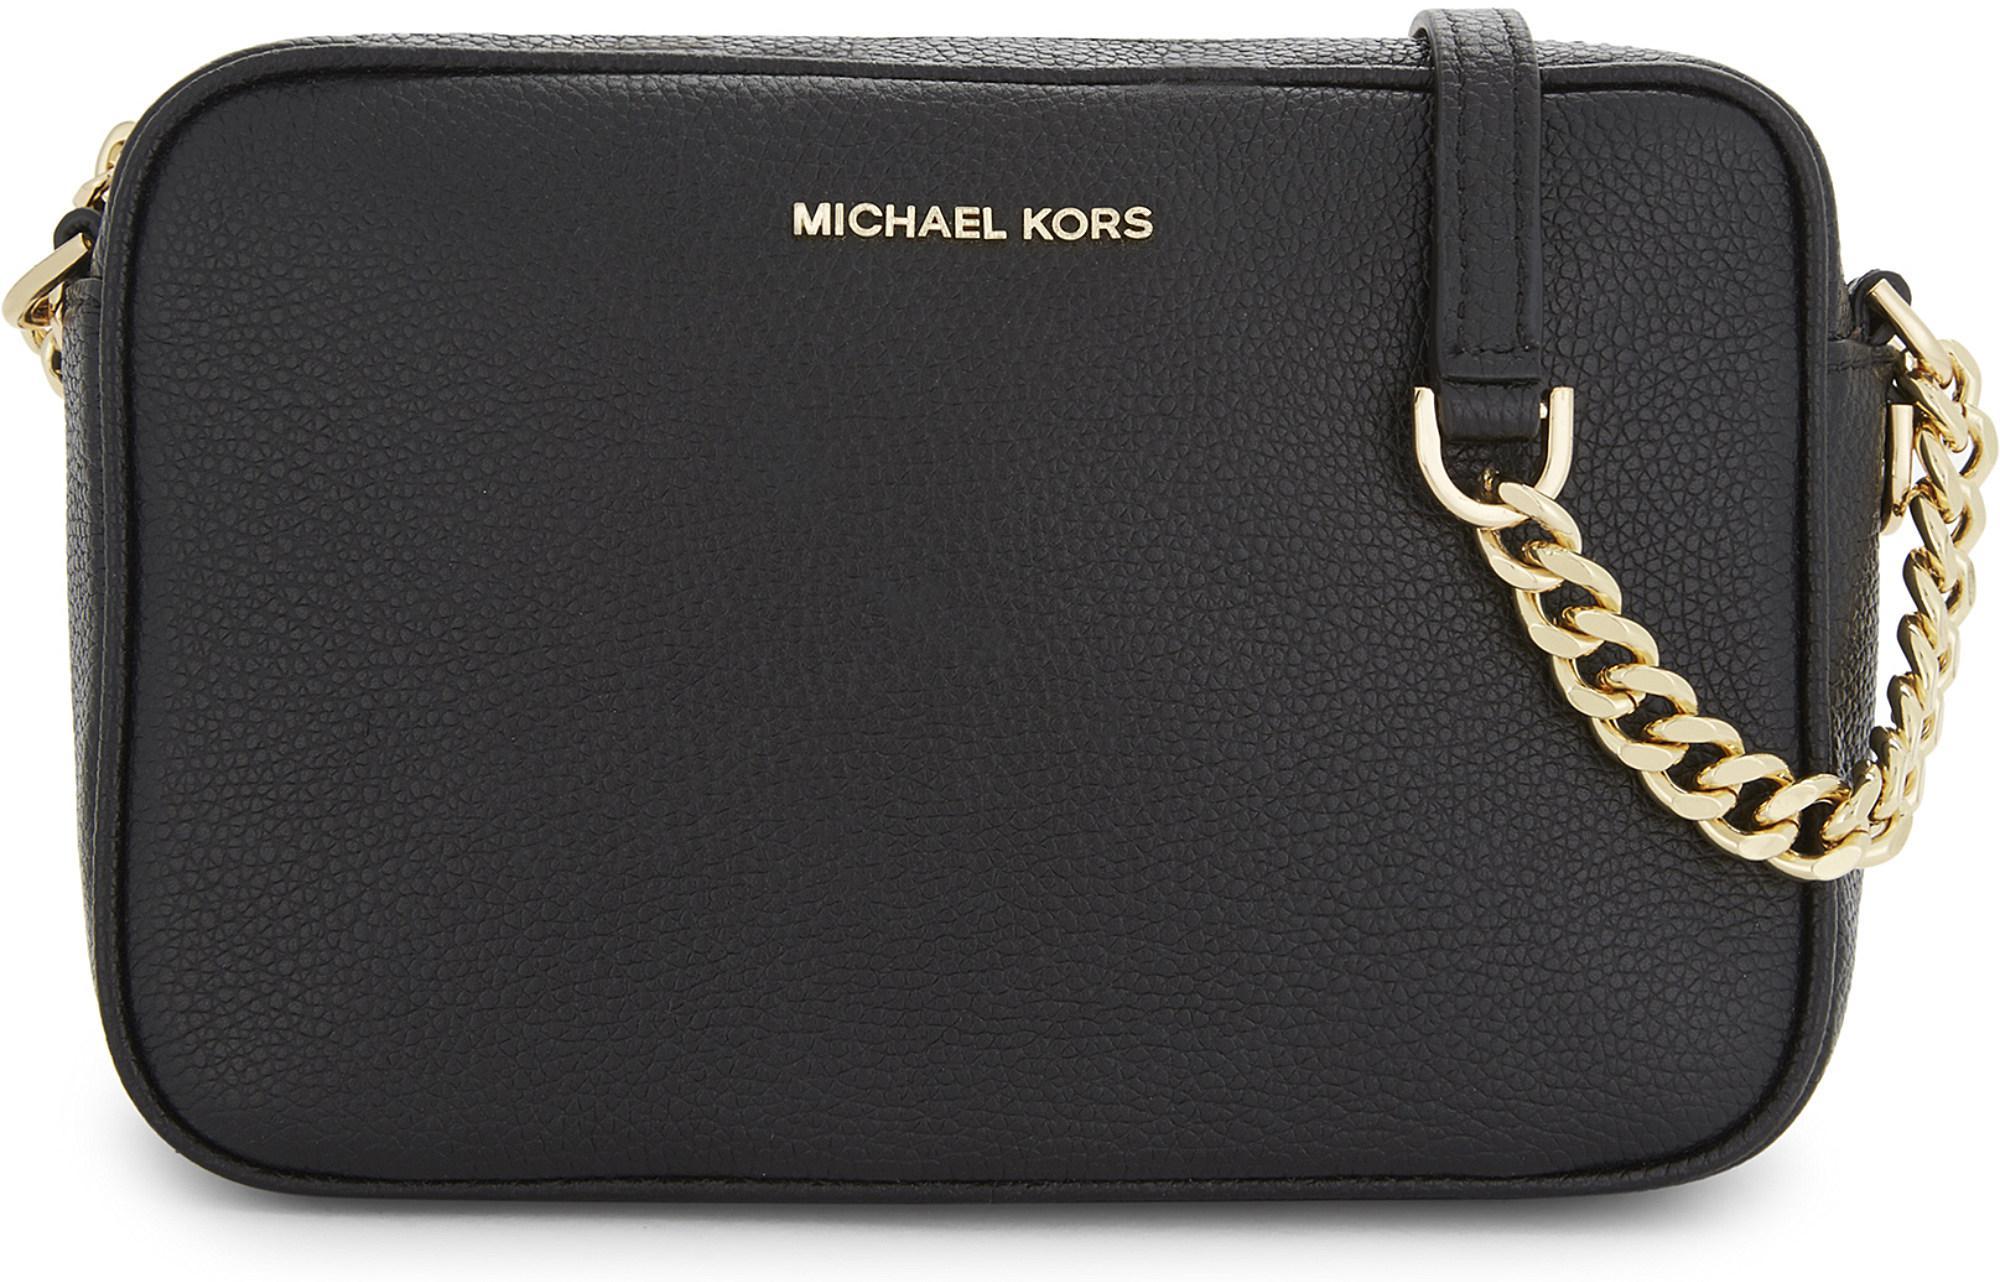 aa9f5036ad6f MICHAEL Michael Kors - Michael Kors Ladies Black Grained Modern Ginny  Leather Cross-body Bag